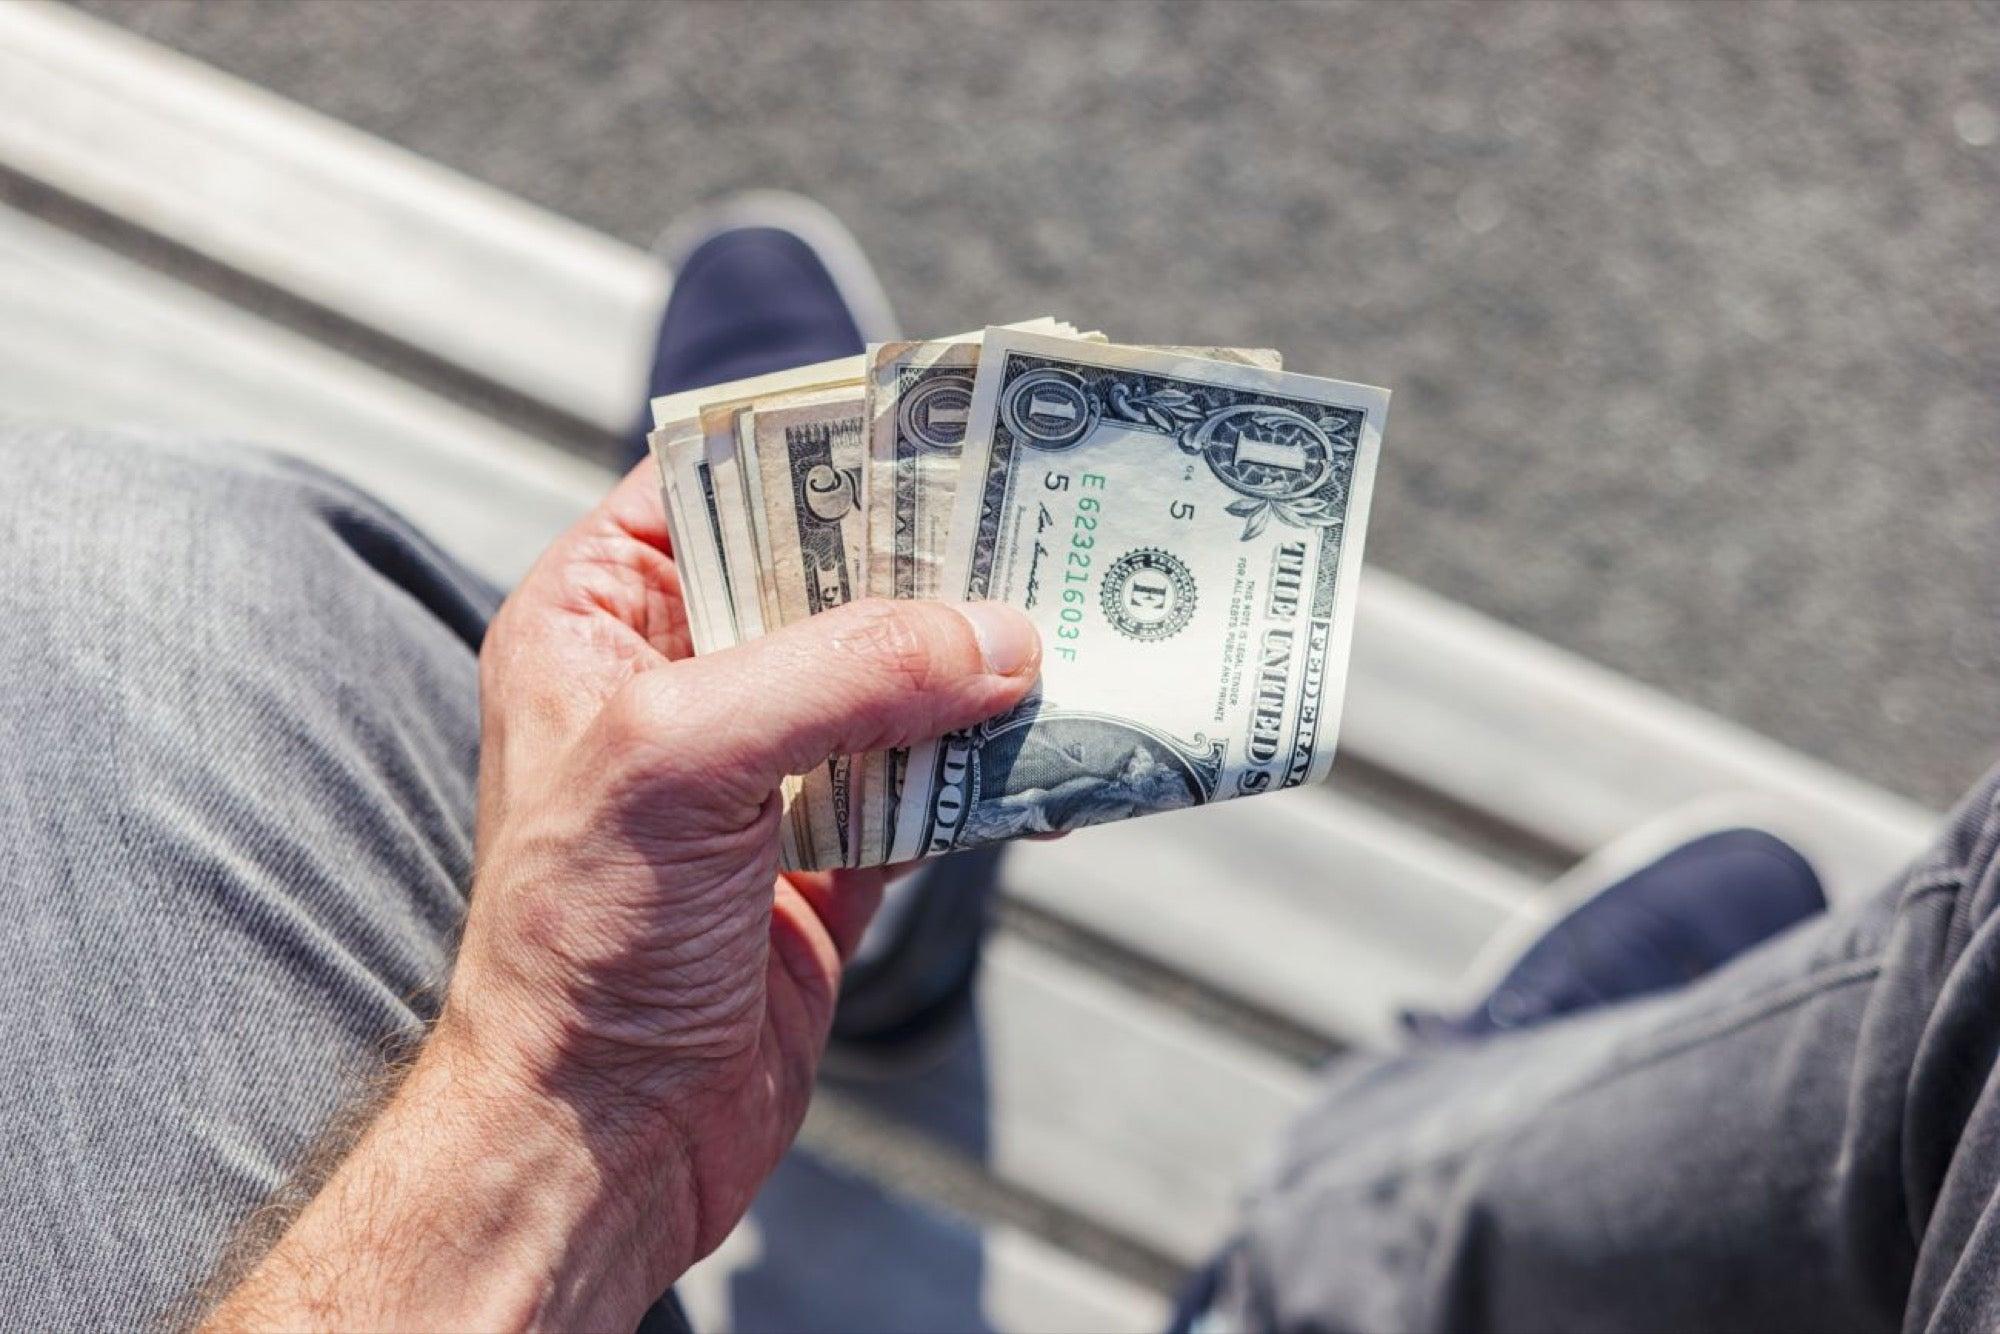 15 Ways to Make Quick Cash